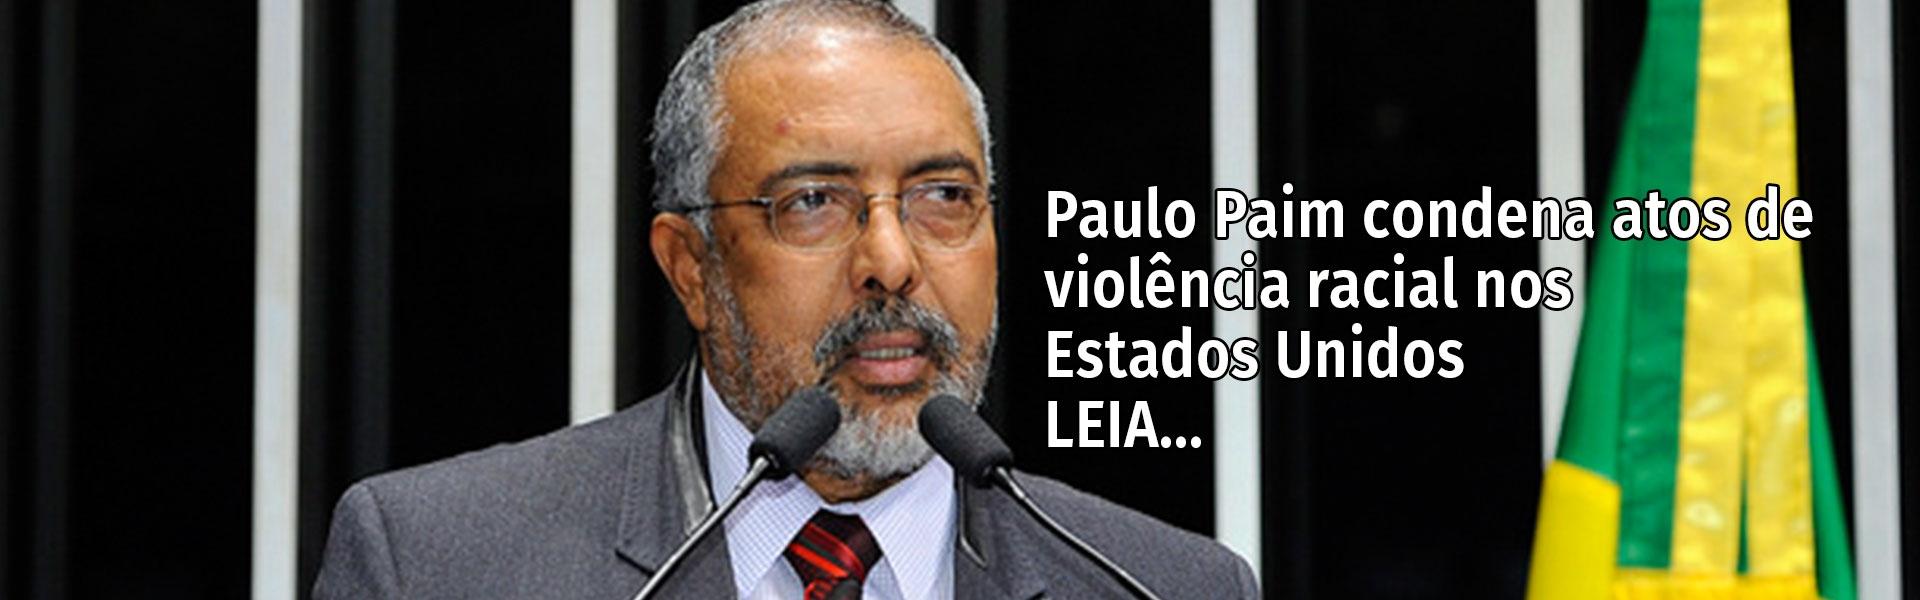 Paulo Paim condena atos de violência racial nos Estados Unidos